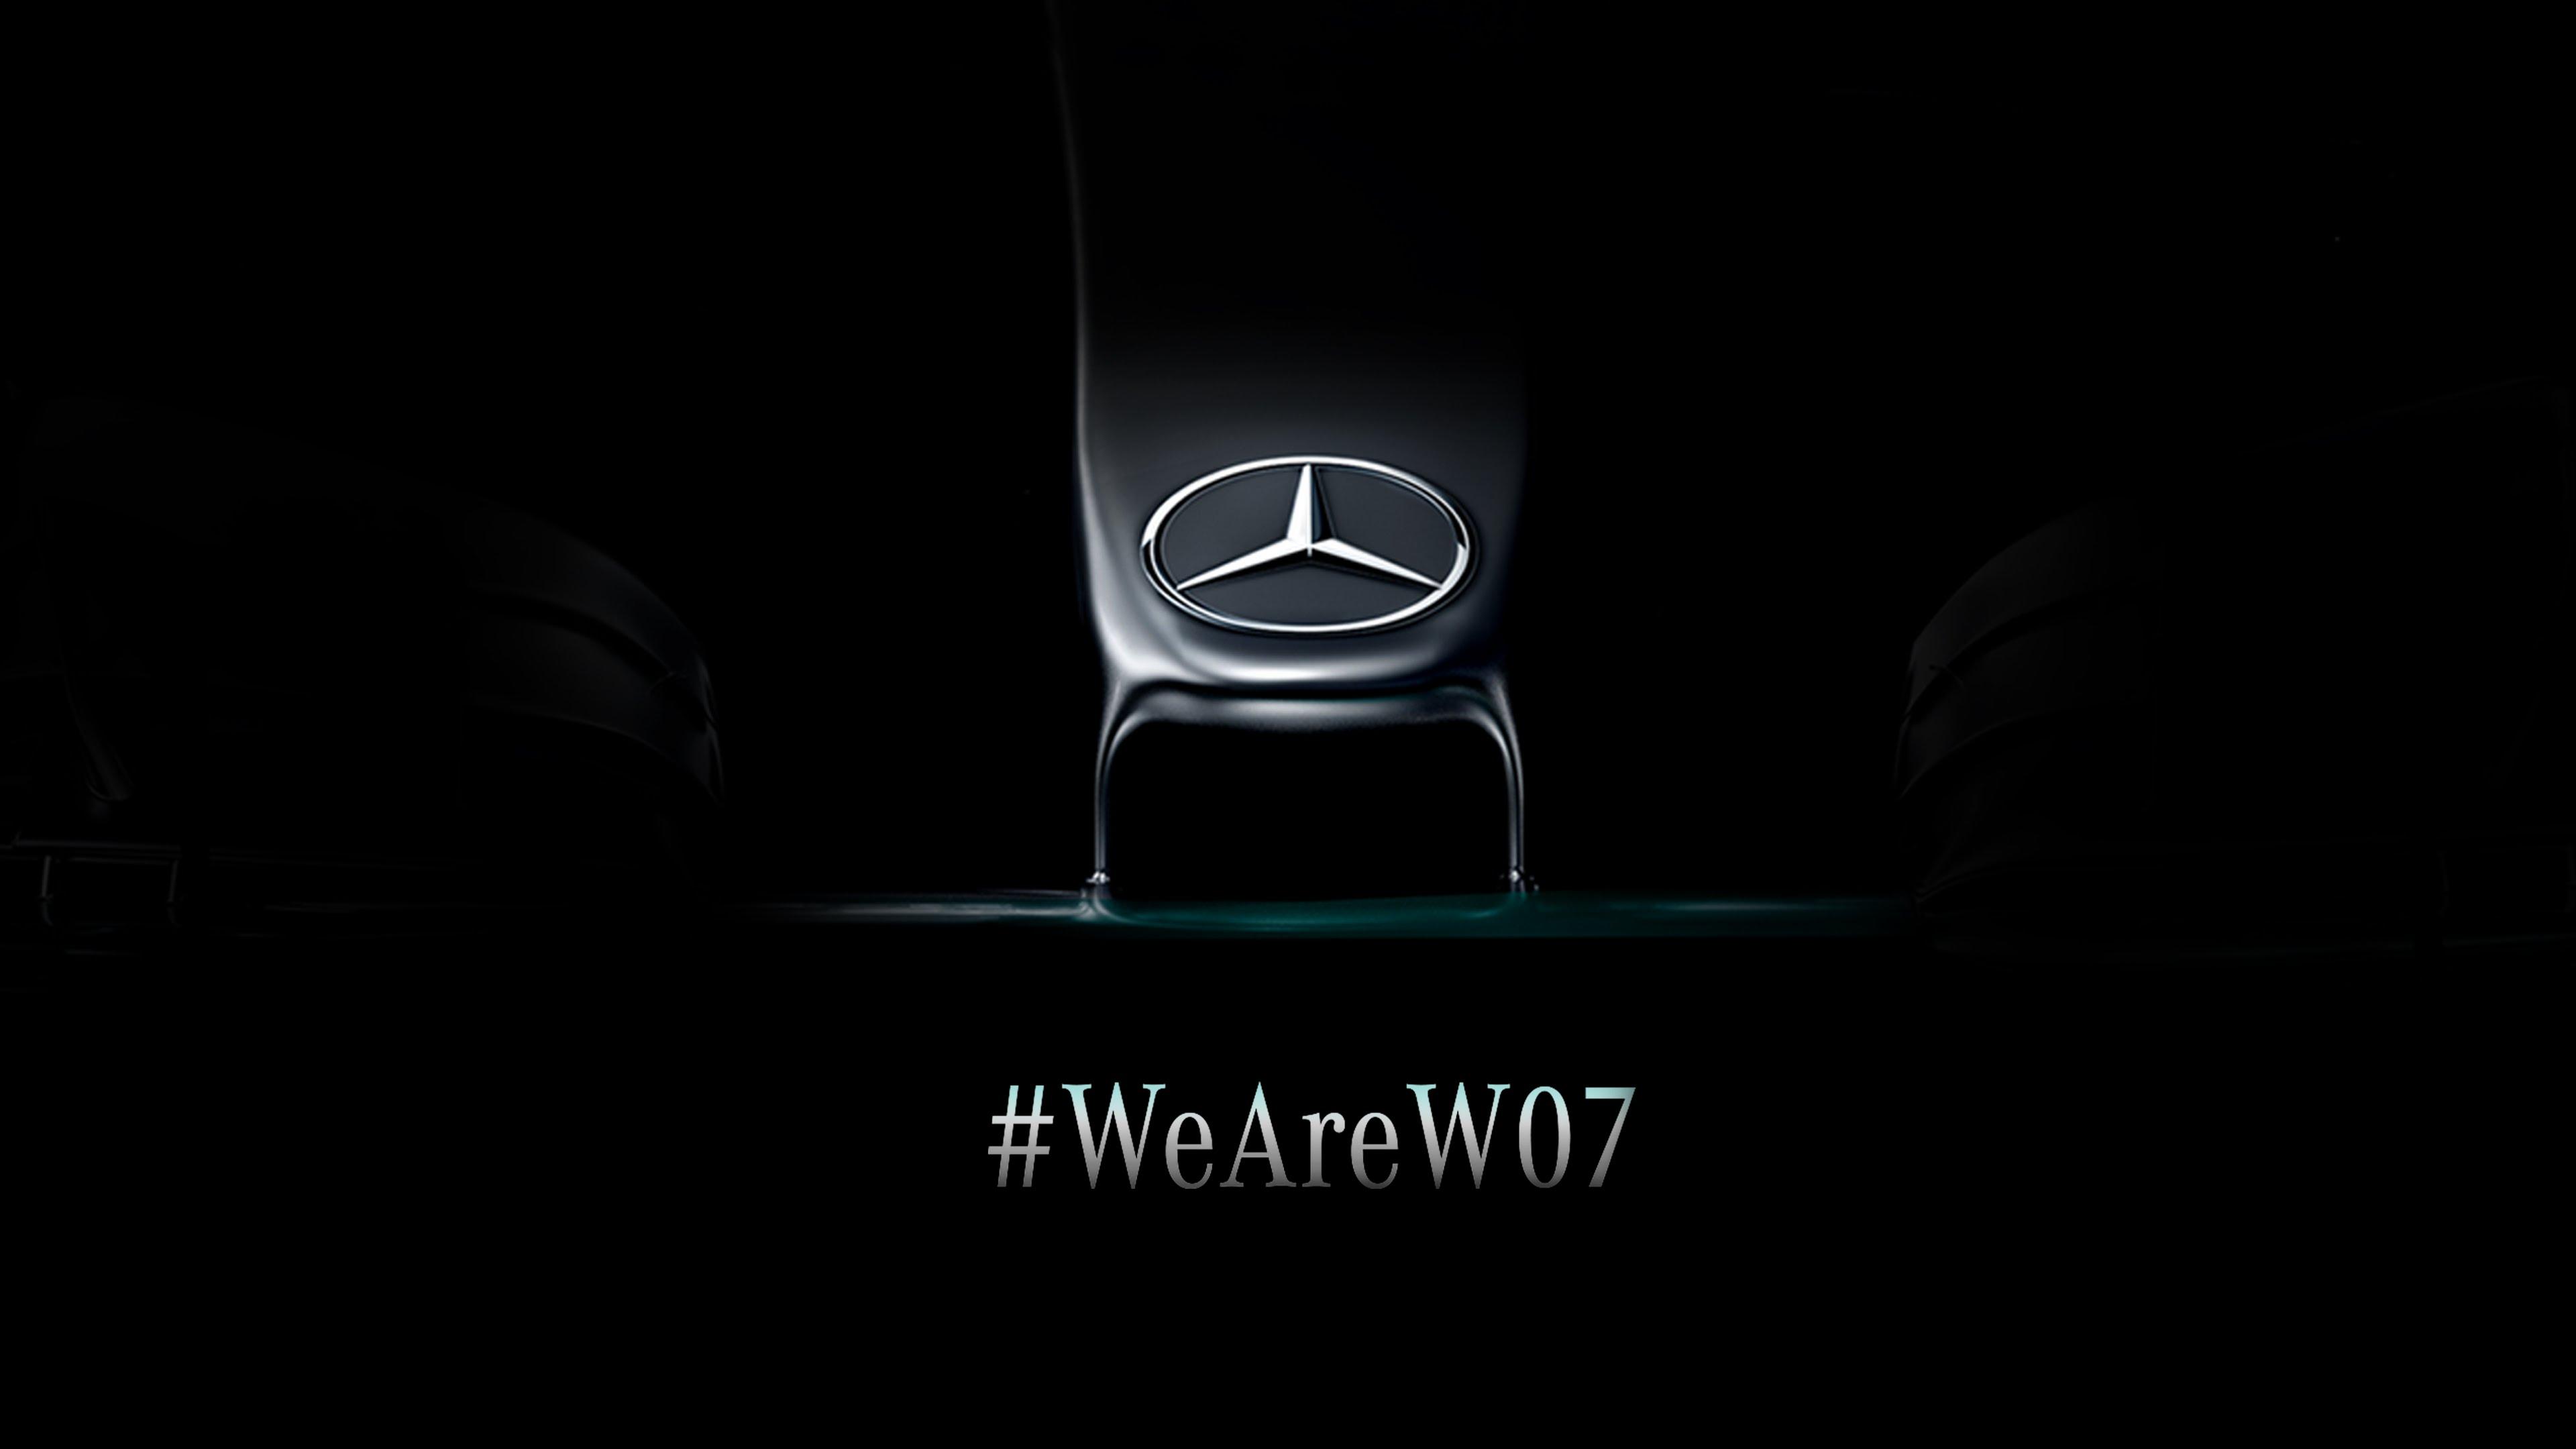 The W07 Not A Secret Agent But A Winning Project